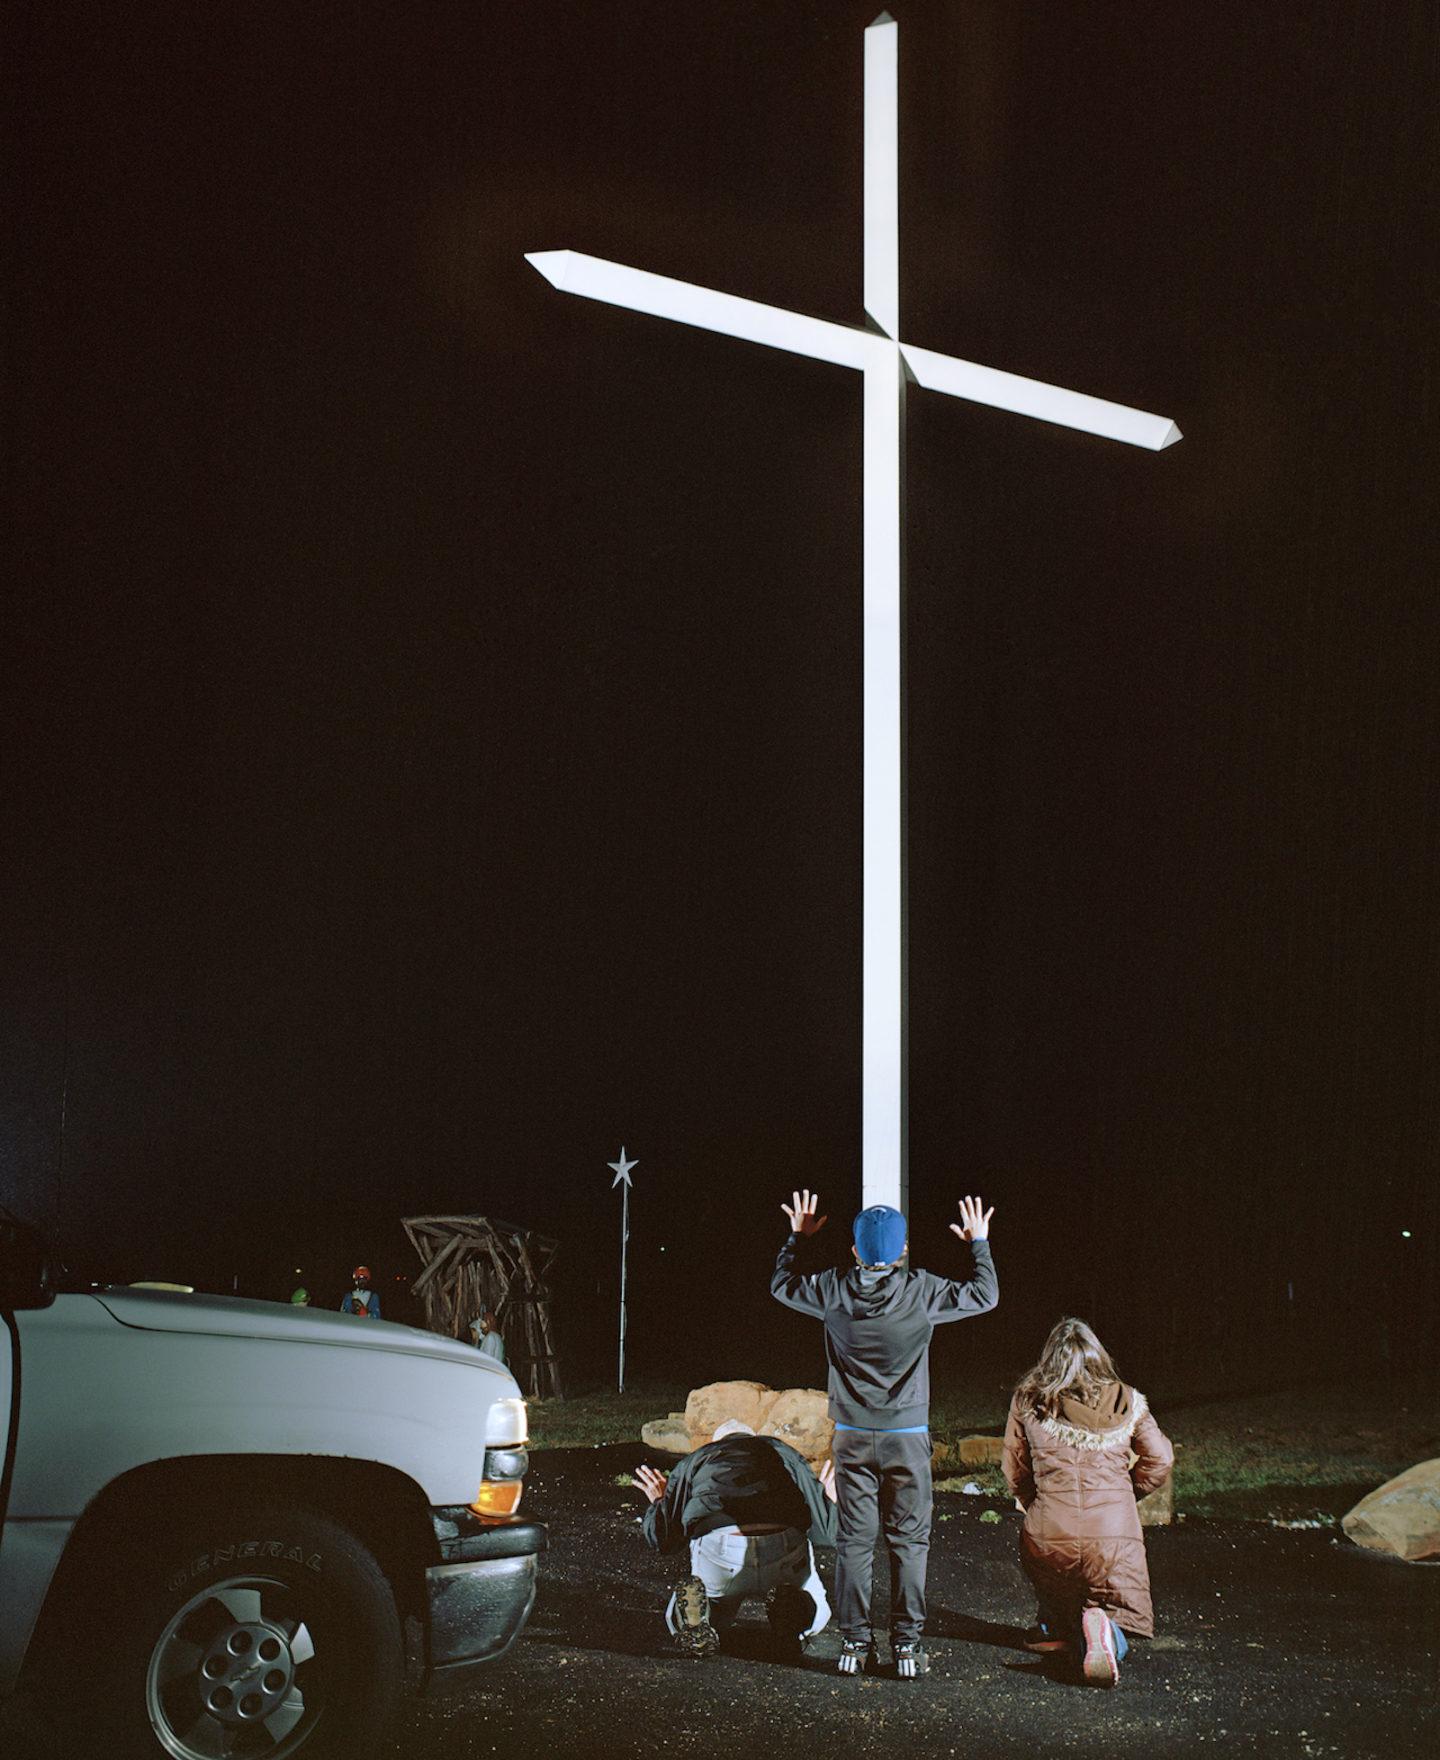 Margins Of Excess, l'America vista da Max Pinckers | Collater.al